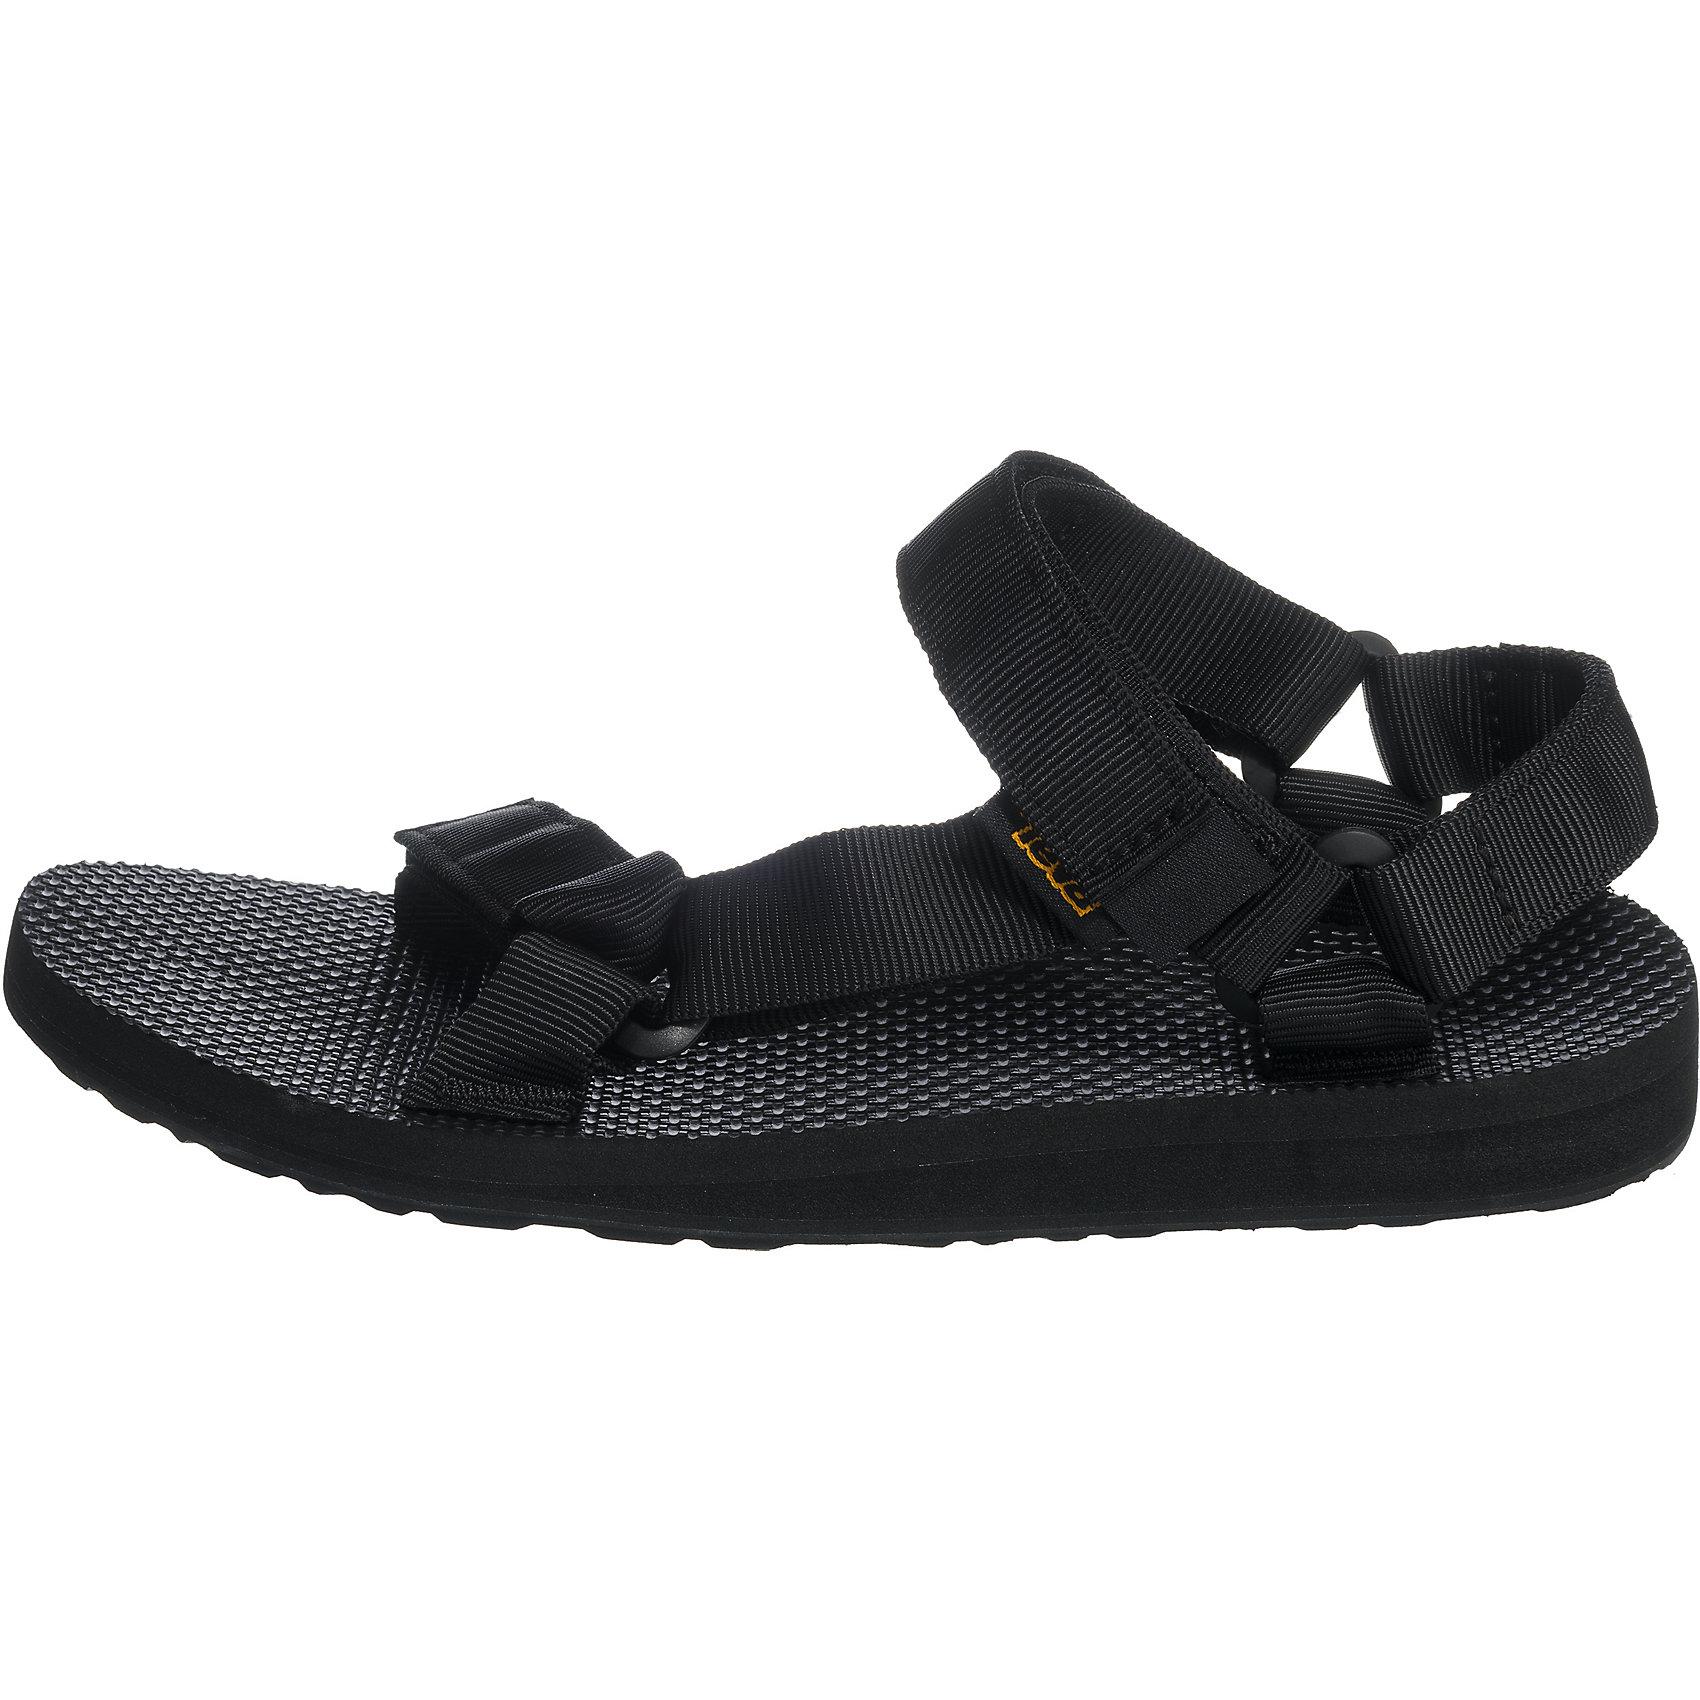 Neu Teva Original Universal Sandaleen 5753794 für Damen schwarz